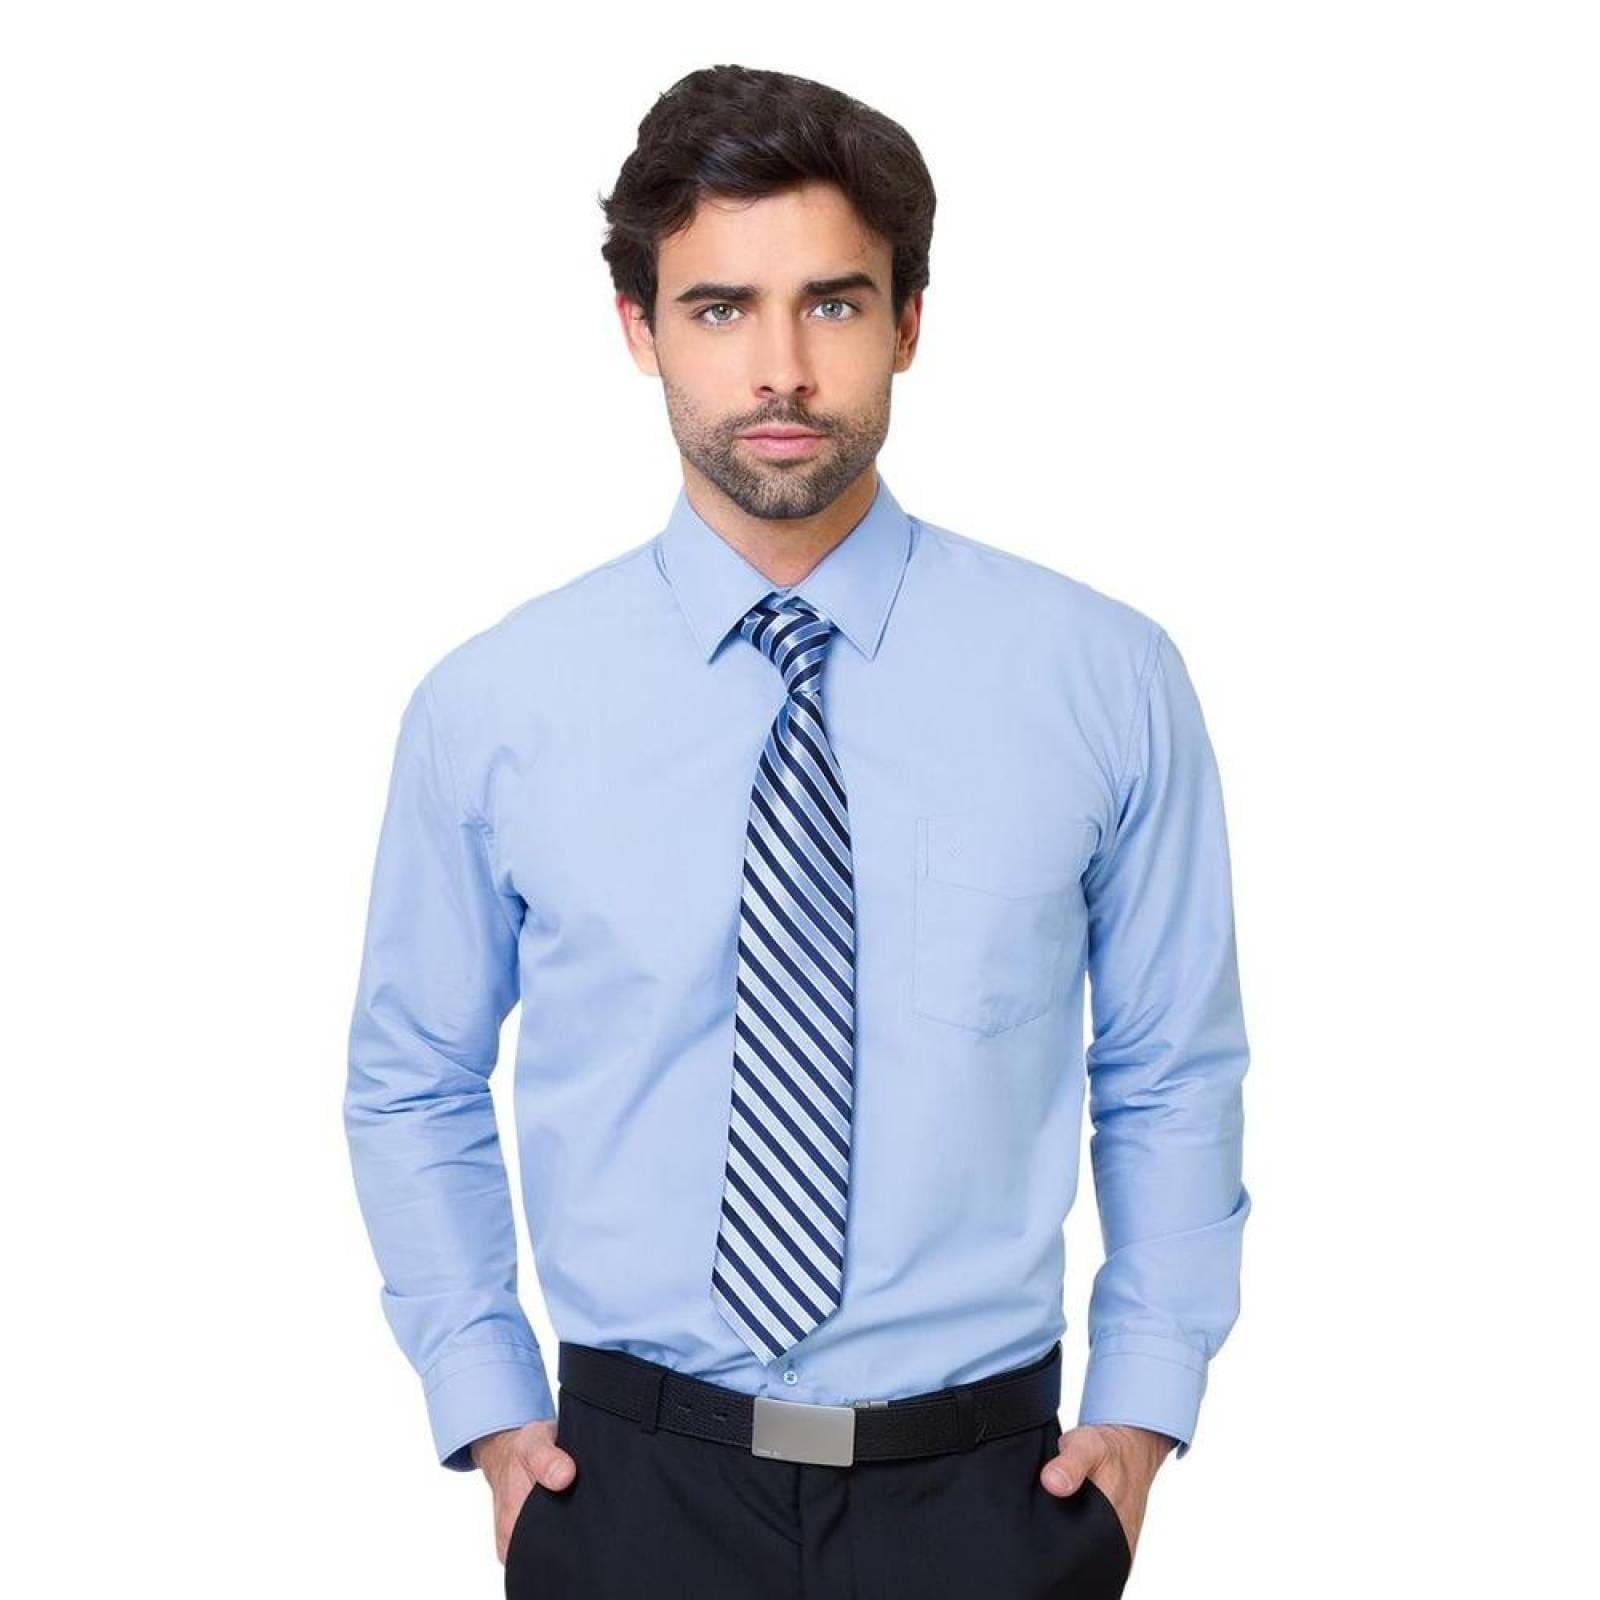 Camisa Vestir Aristos Hombre Azul Algodon Poliester 3005